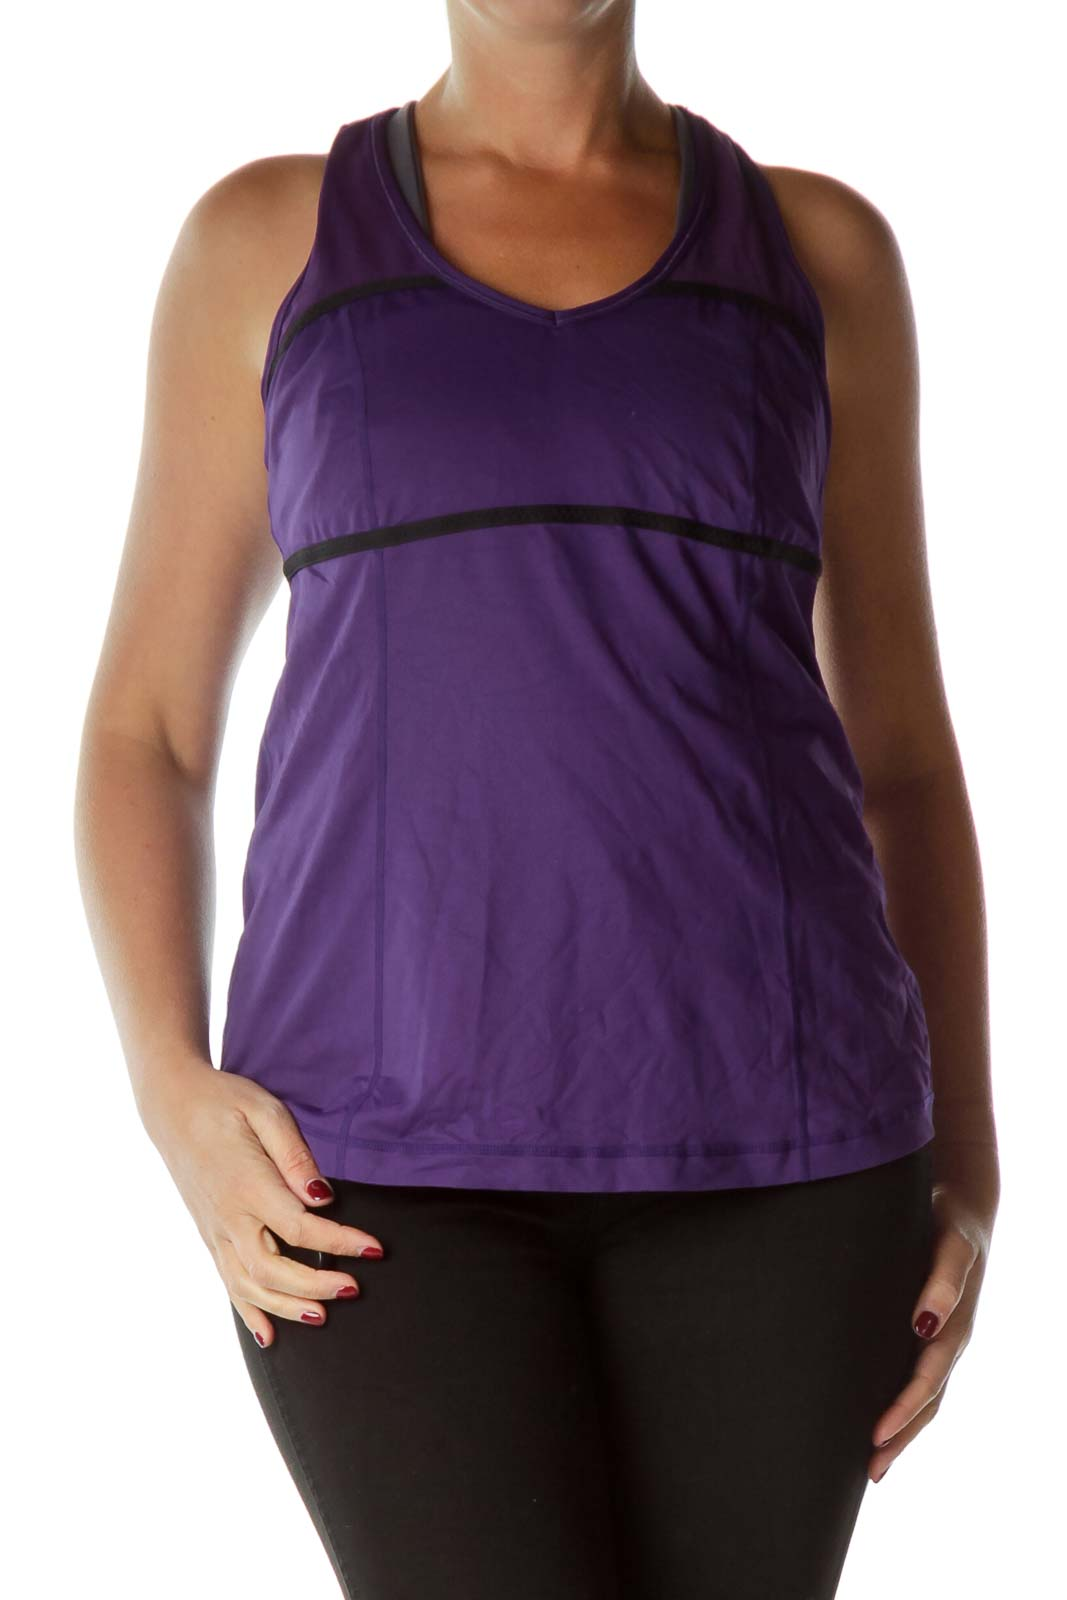 Purple Yoga Tank